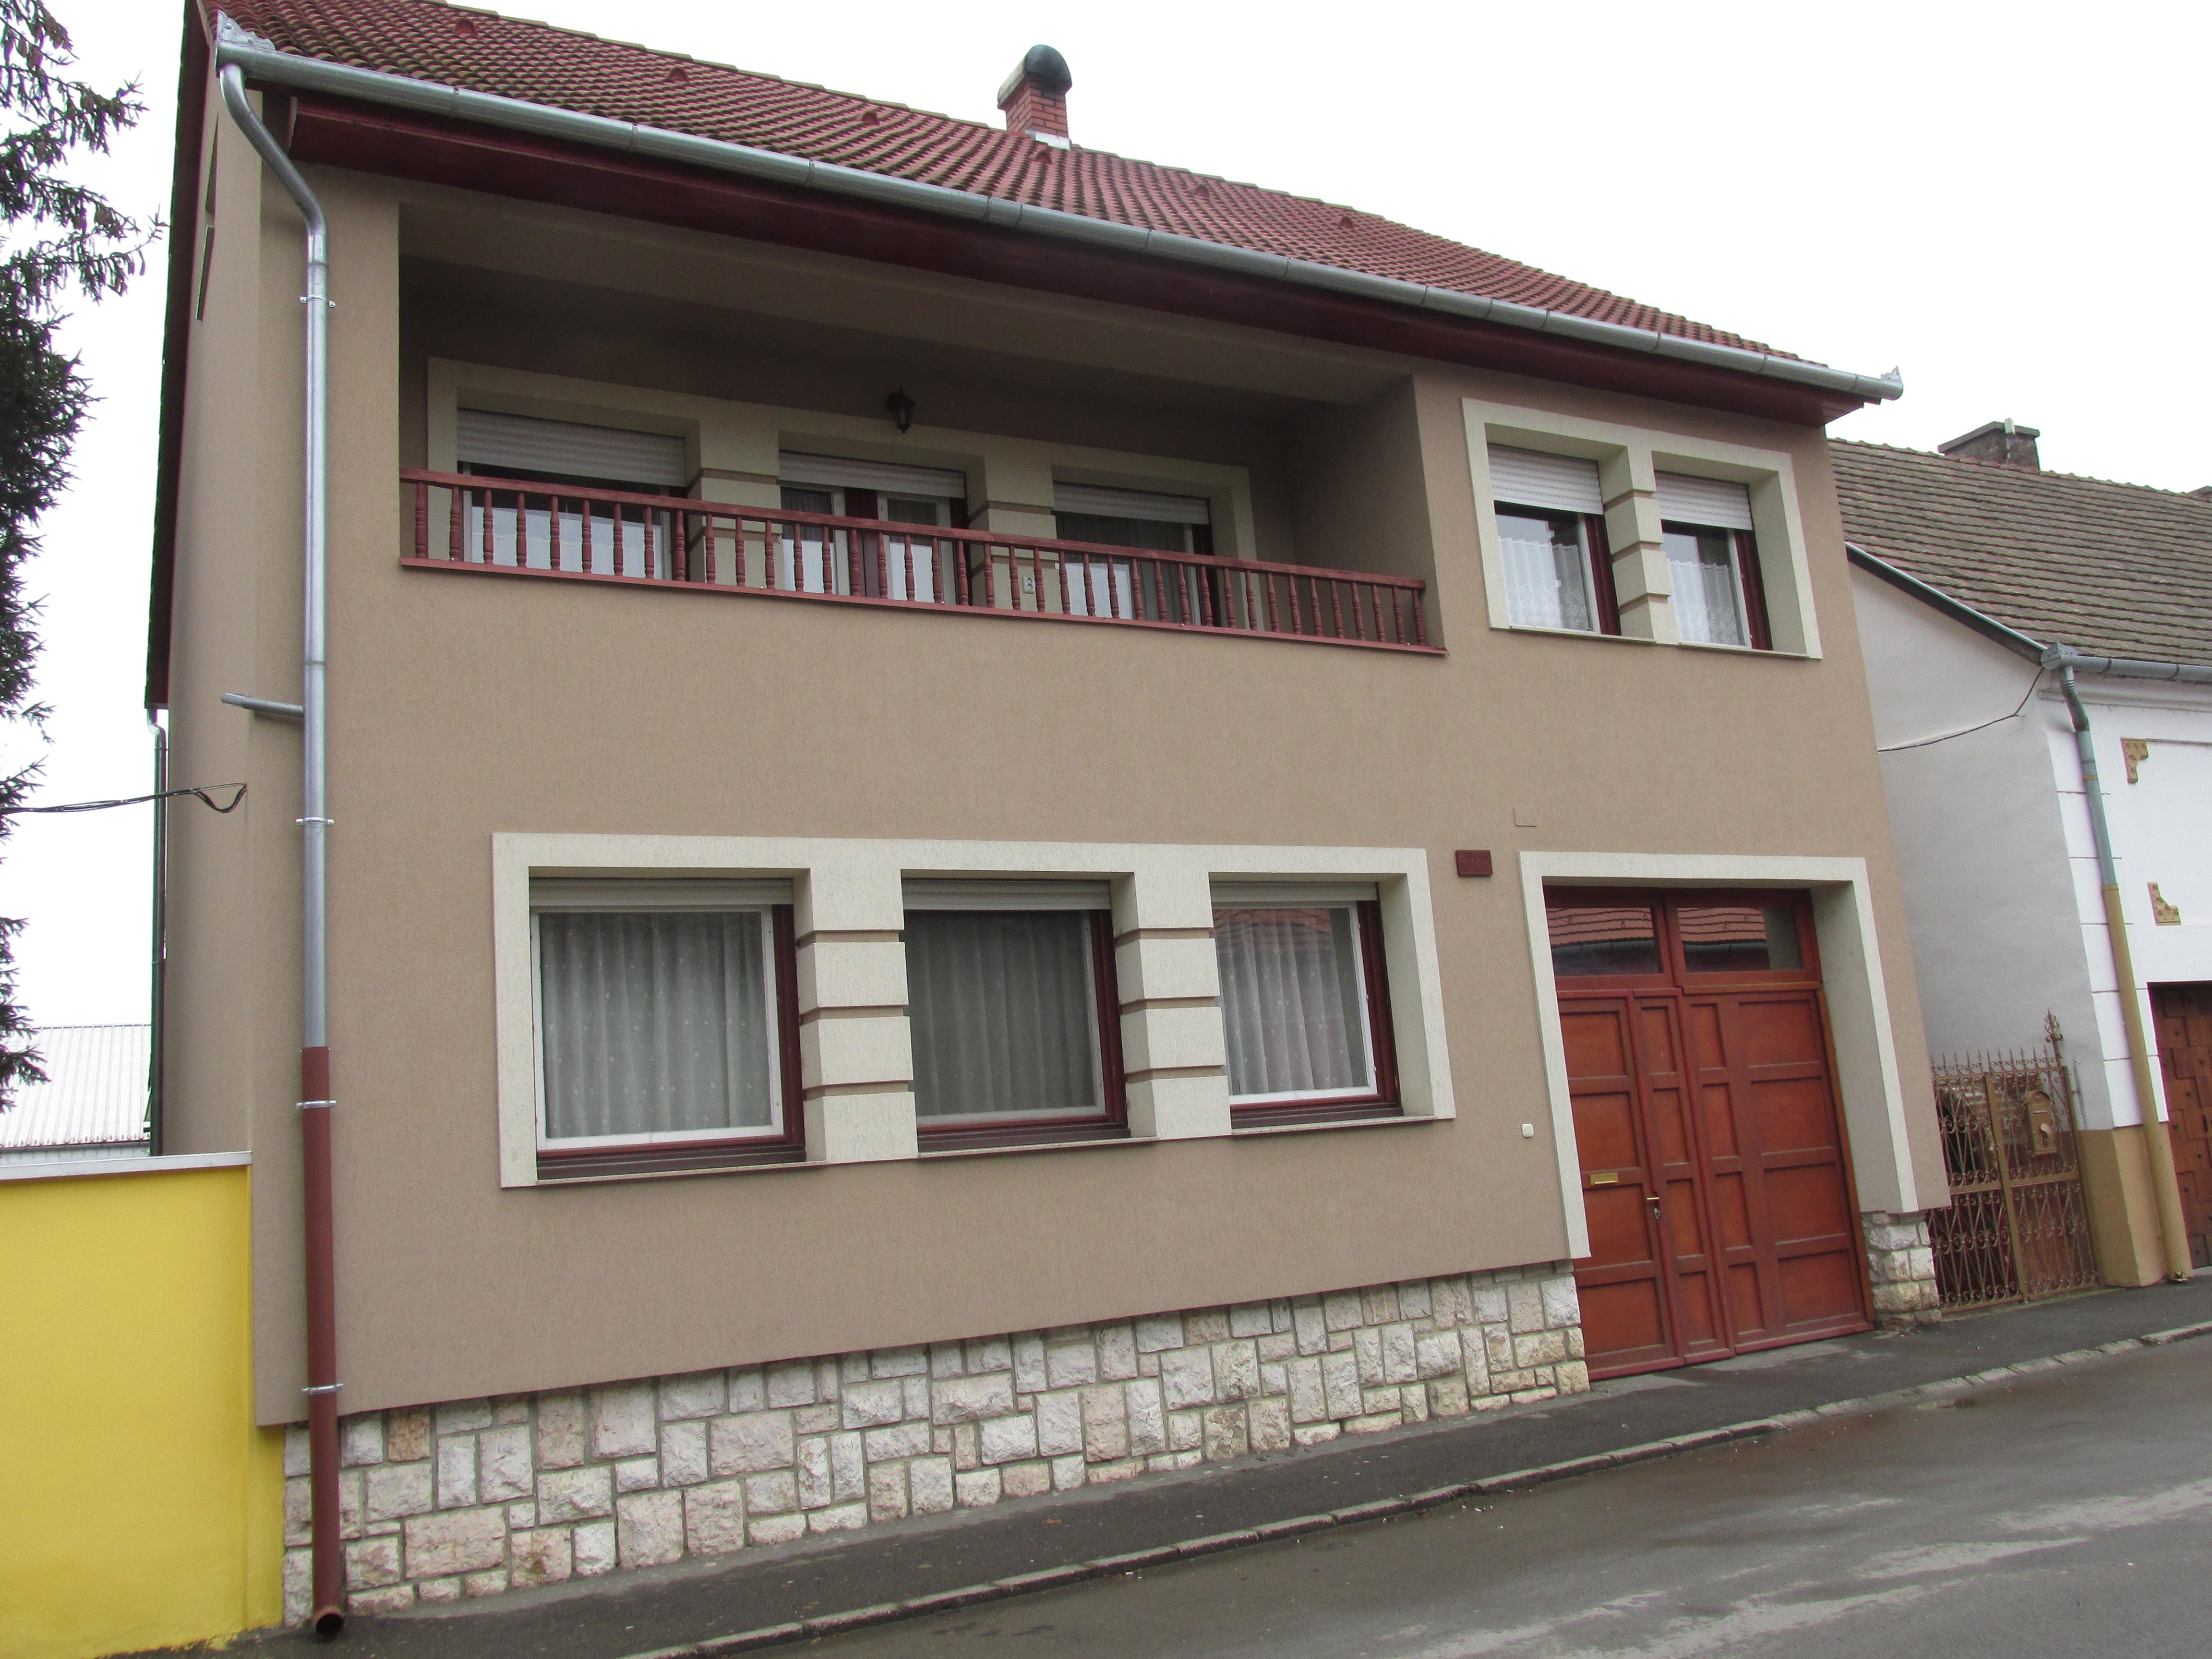 Vente maison ind pendante szigetv r baranya hongrie v r u 16 7900 hong - Maison independante energetiquement ...